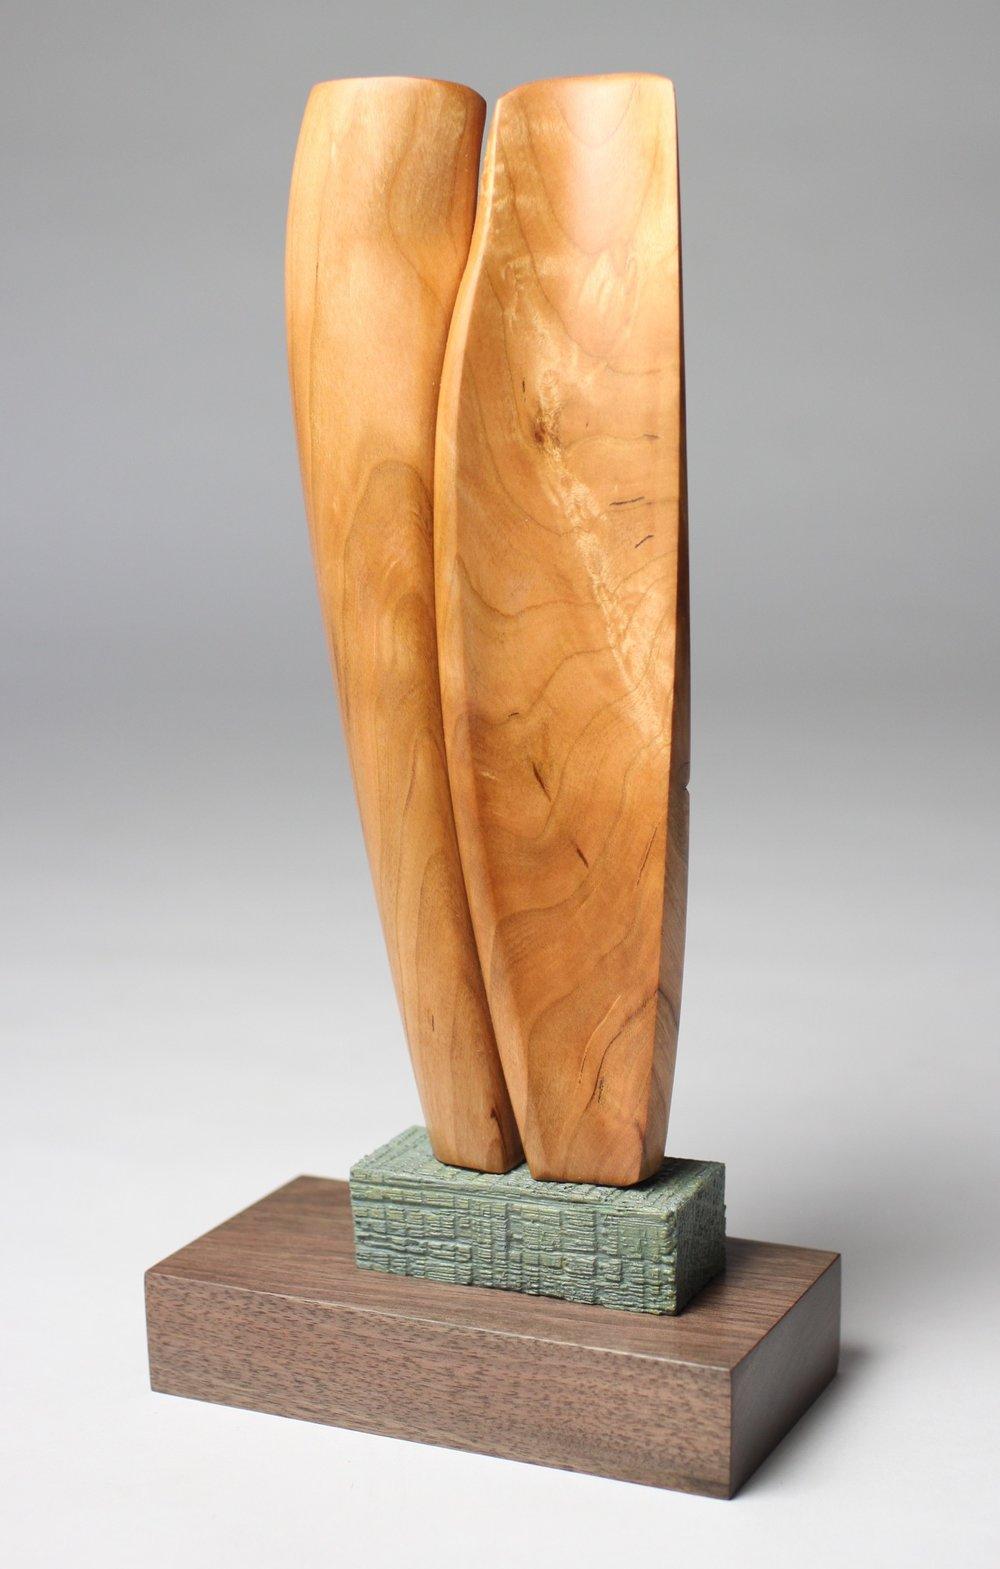 Sculpture #1 (view 1)